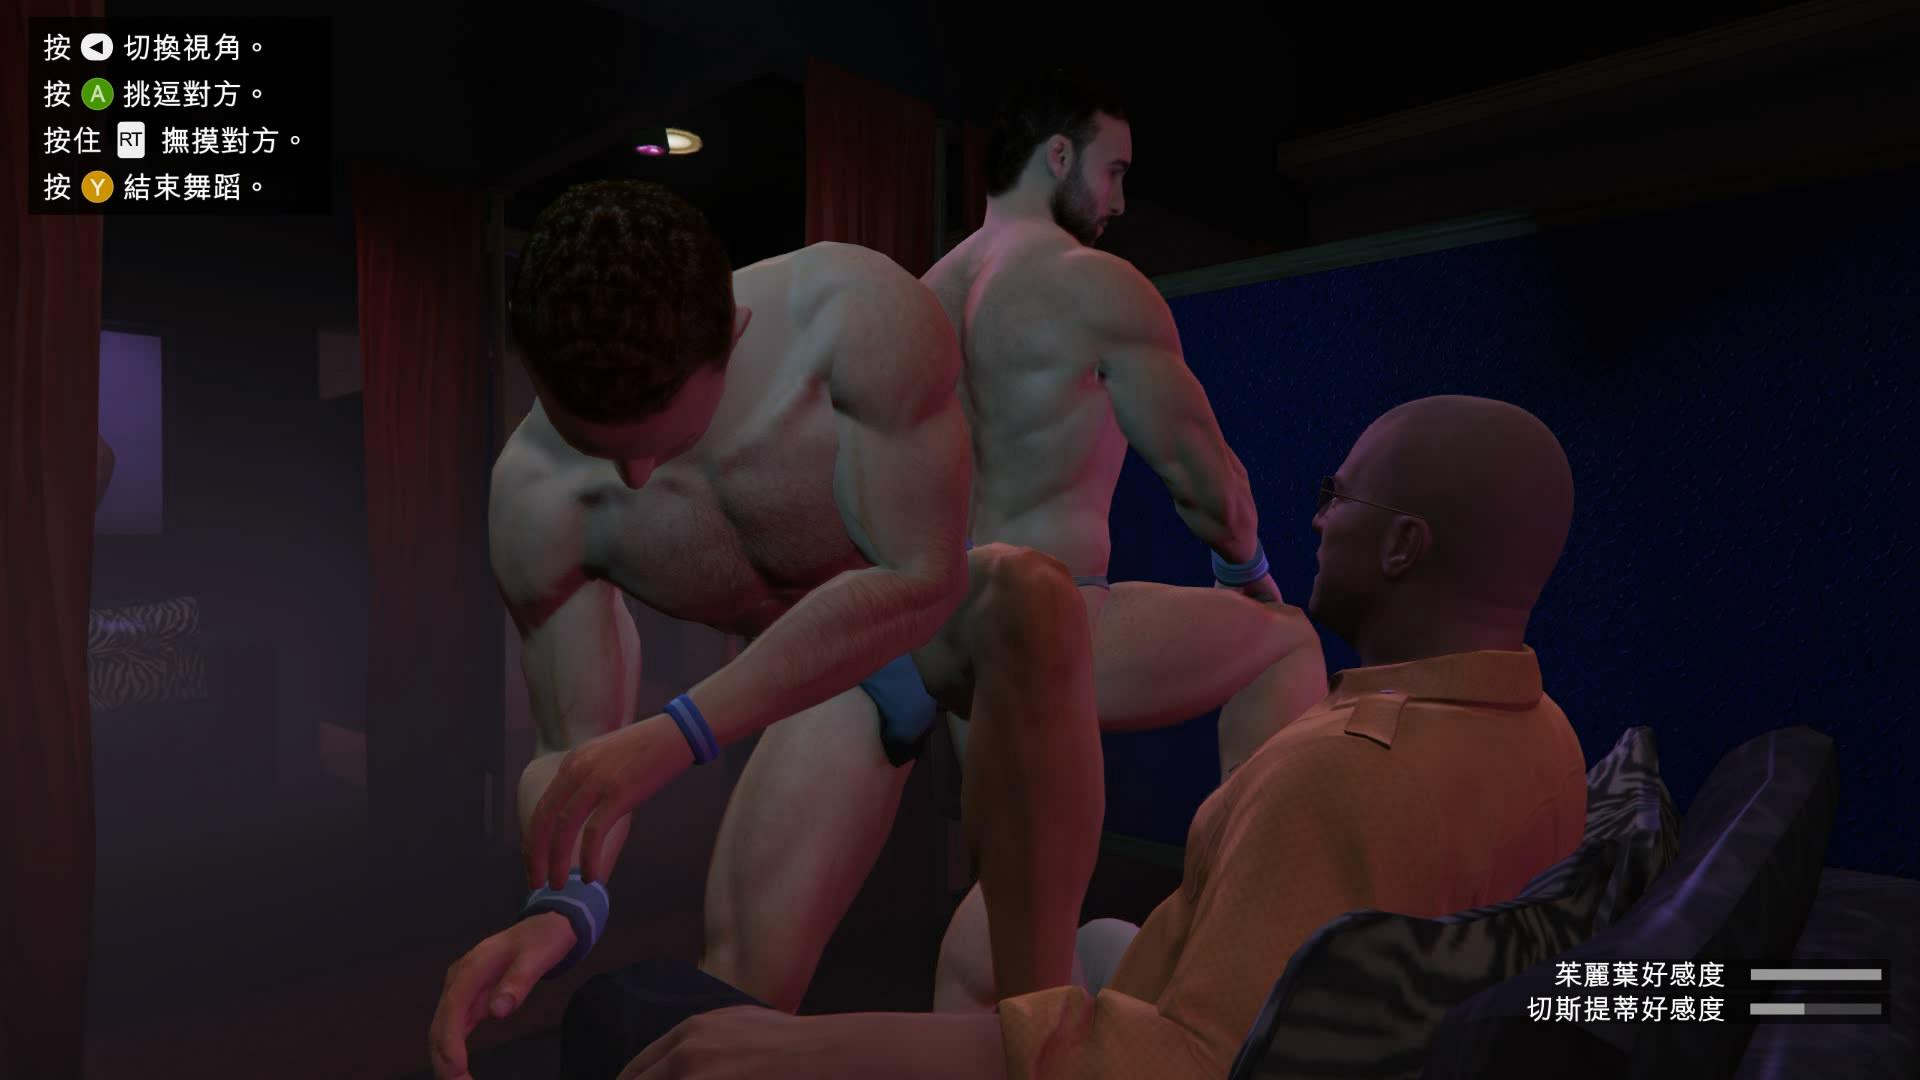 Male stripper forum